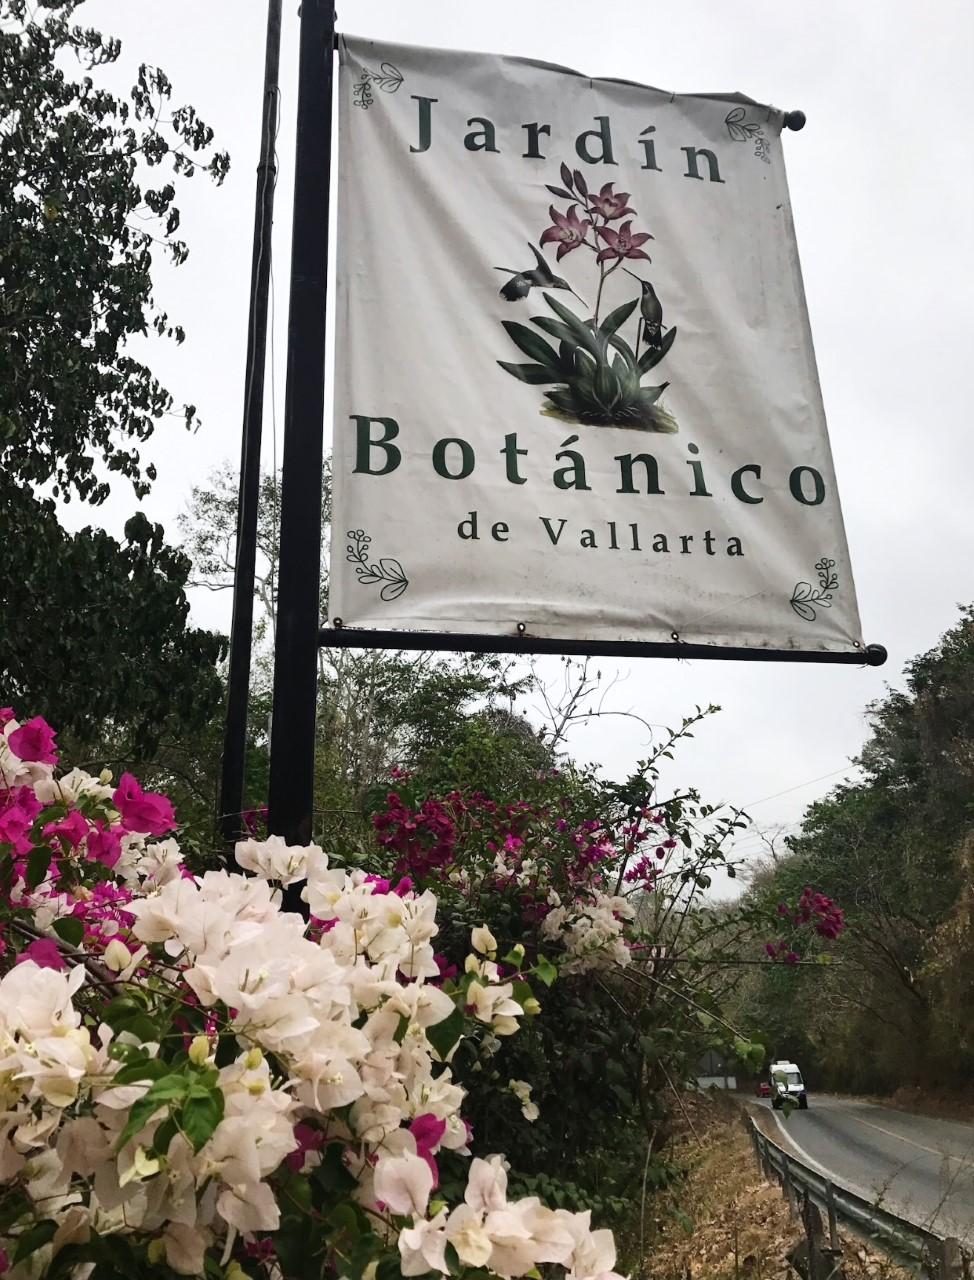 Botanical Garden in Puerto Vallarta